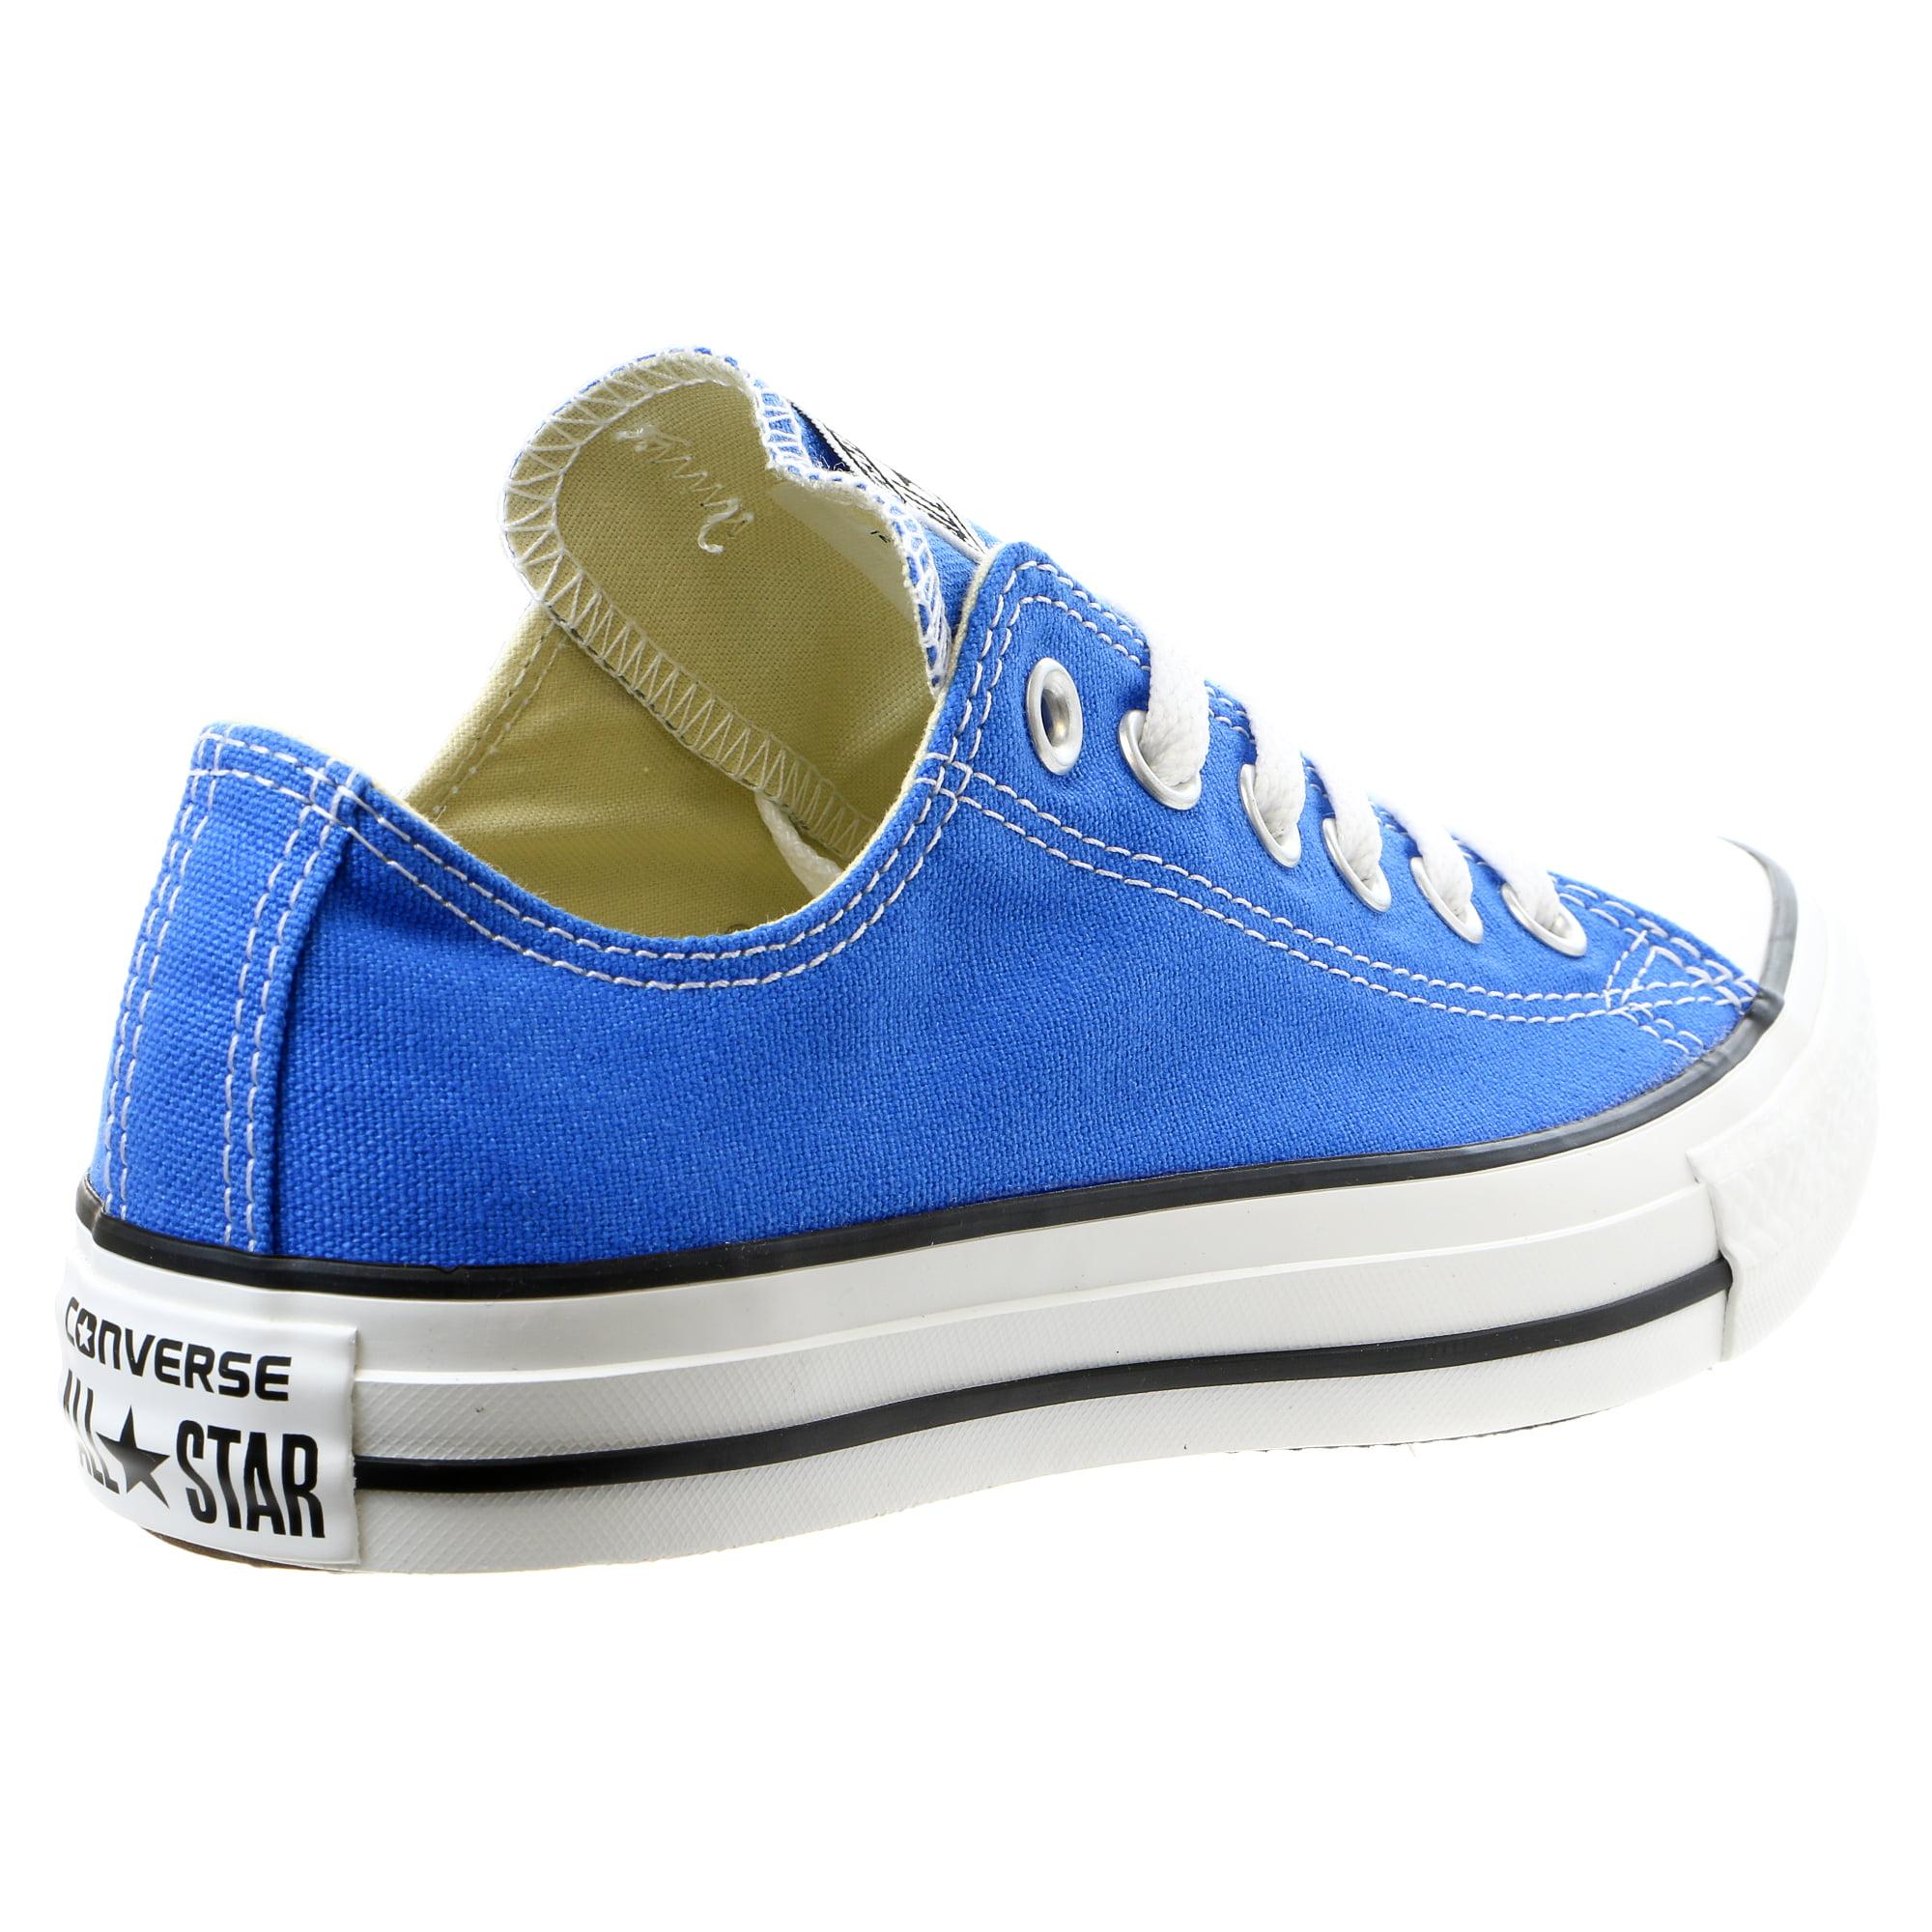 CONVERSE CT All Star OX Fashion Sneaker Shoe - Unisex